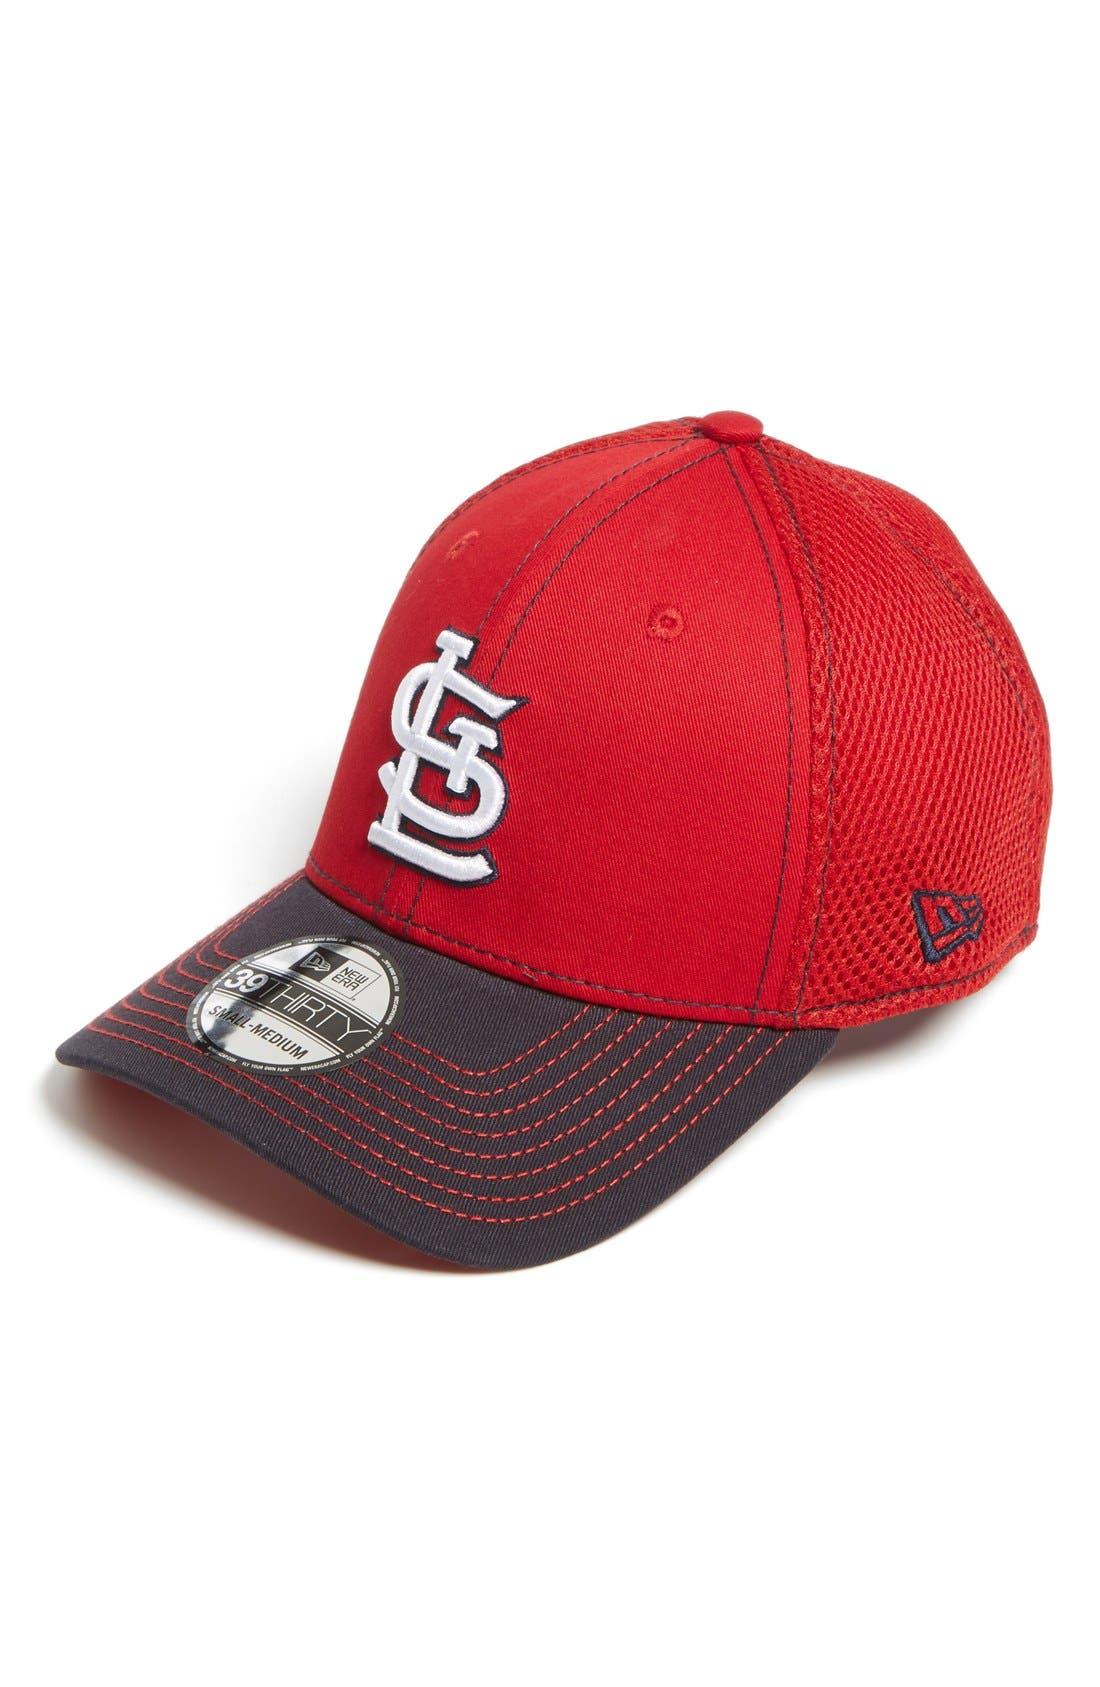 Main Image - New Era Cap '2Tone Neo - St. Louis Cardinals' Baseball Cap